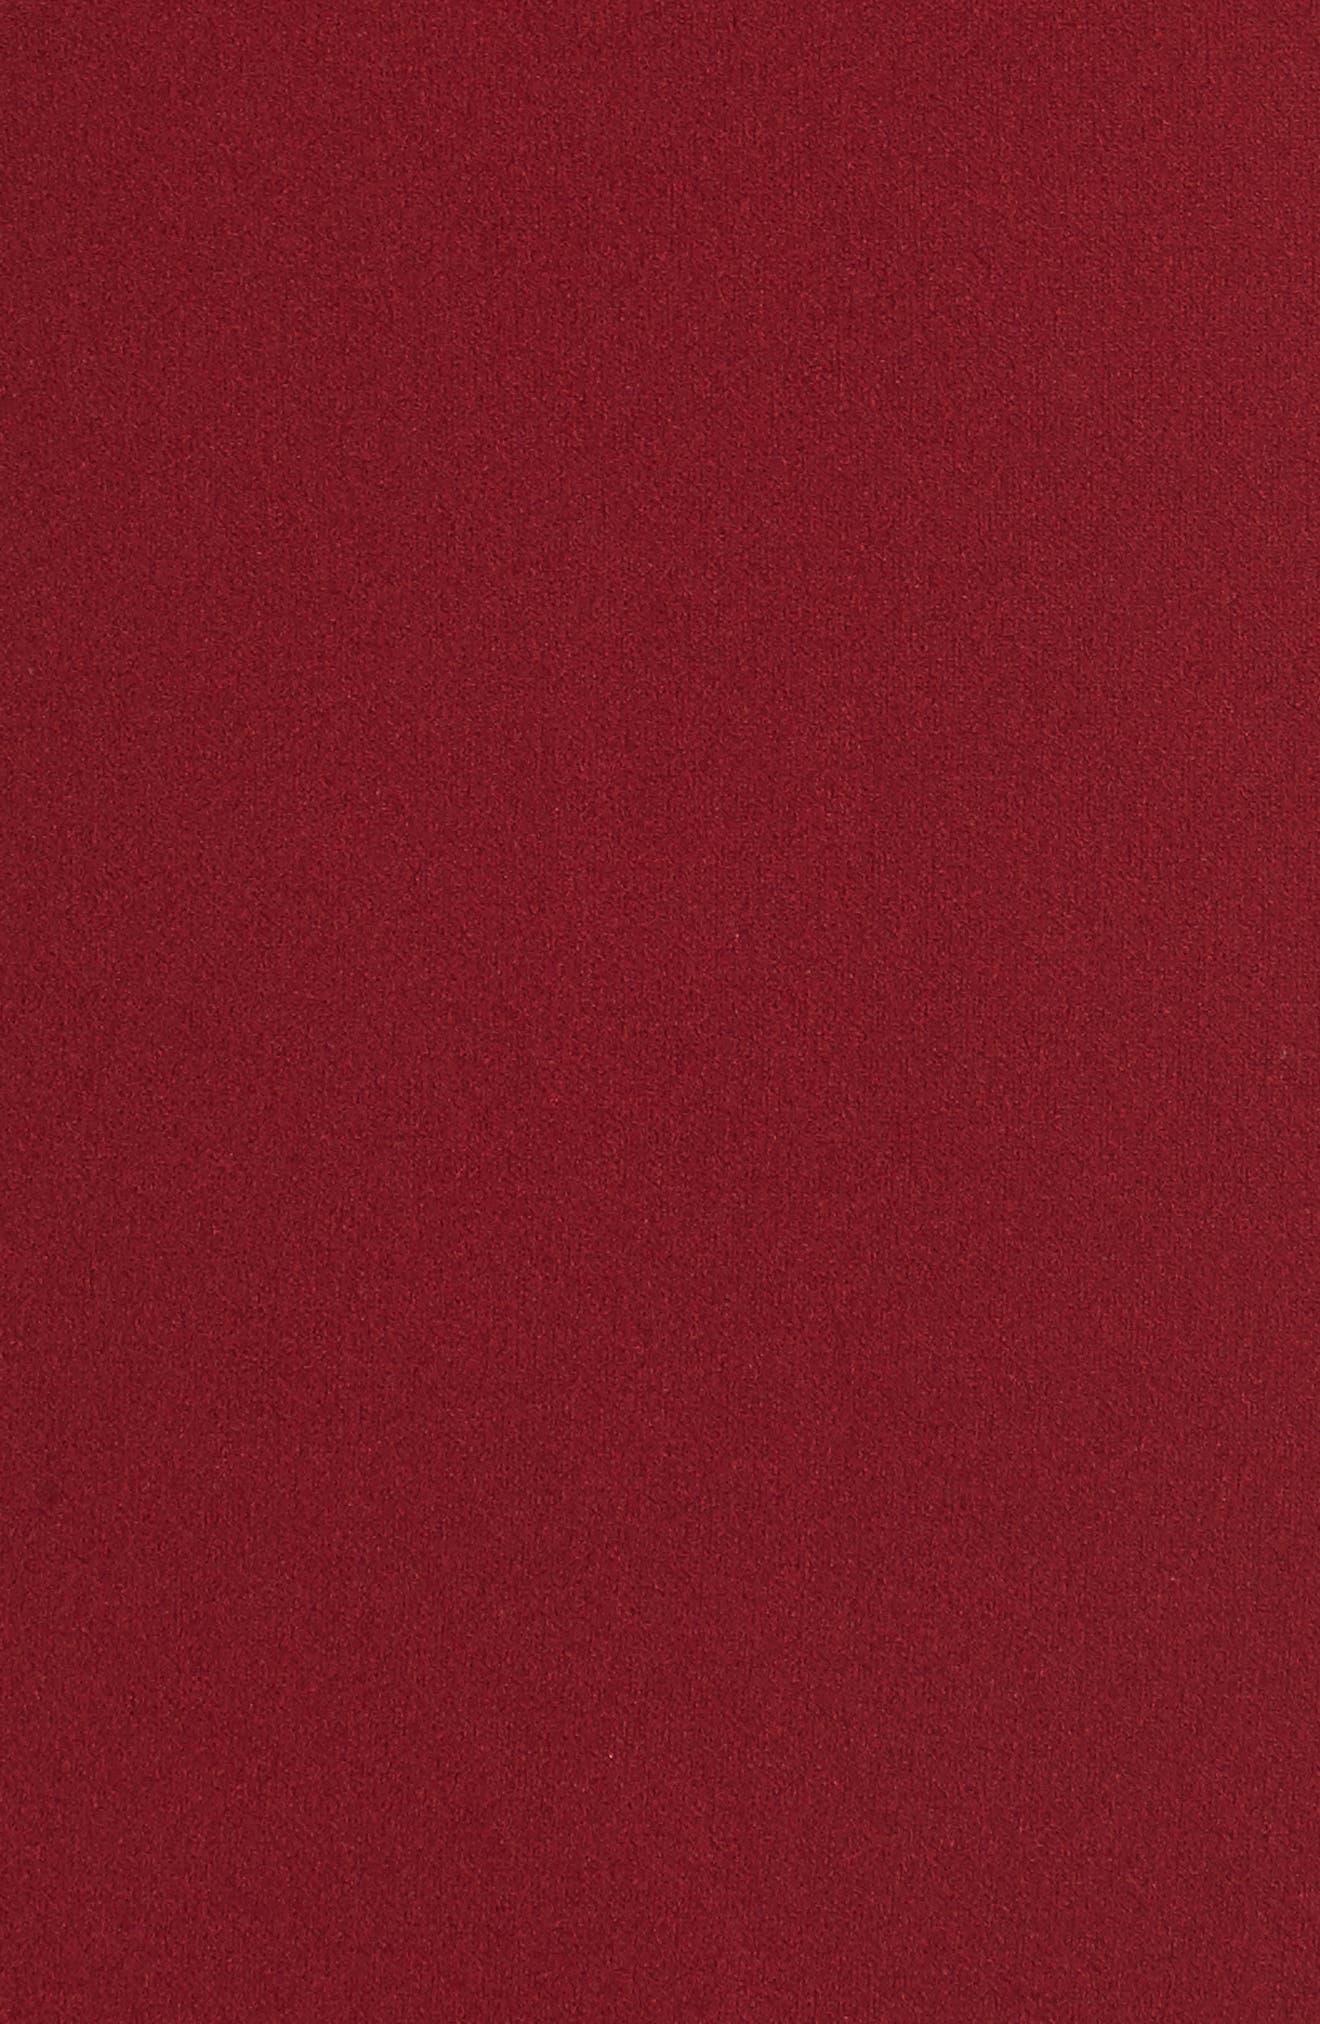 Choker Neck Body-Con Dress,                             Alternate thumbnail 5, color,                             Merlot